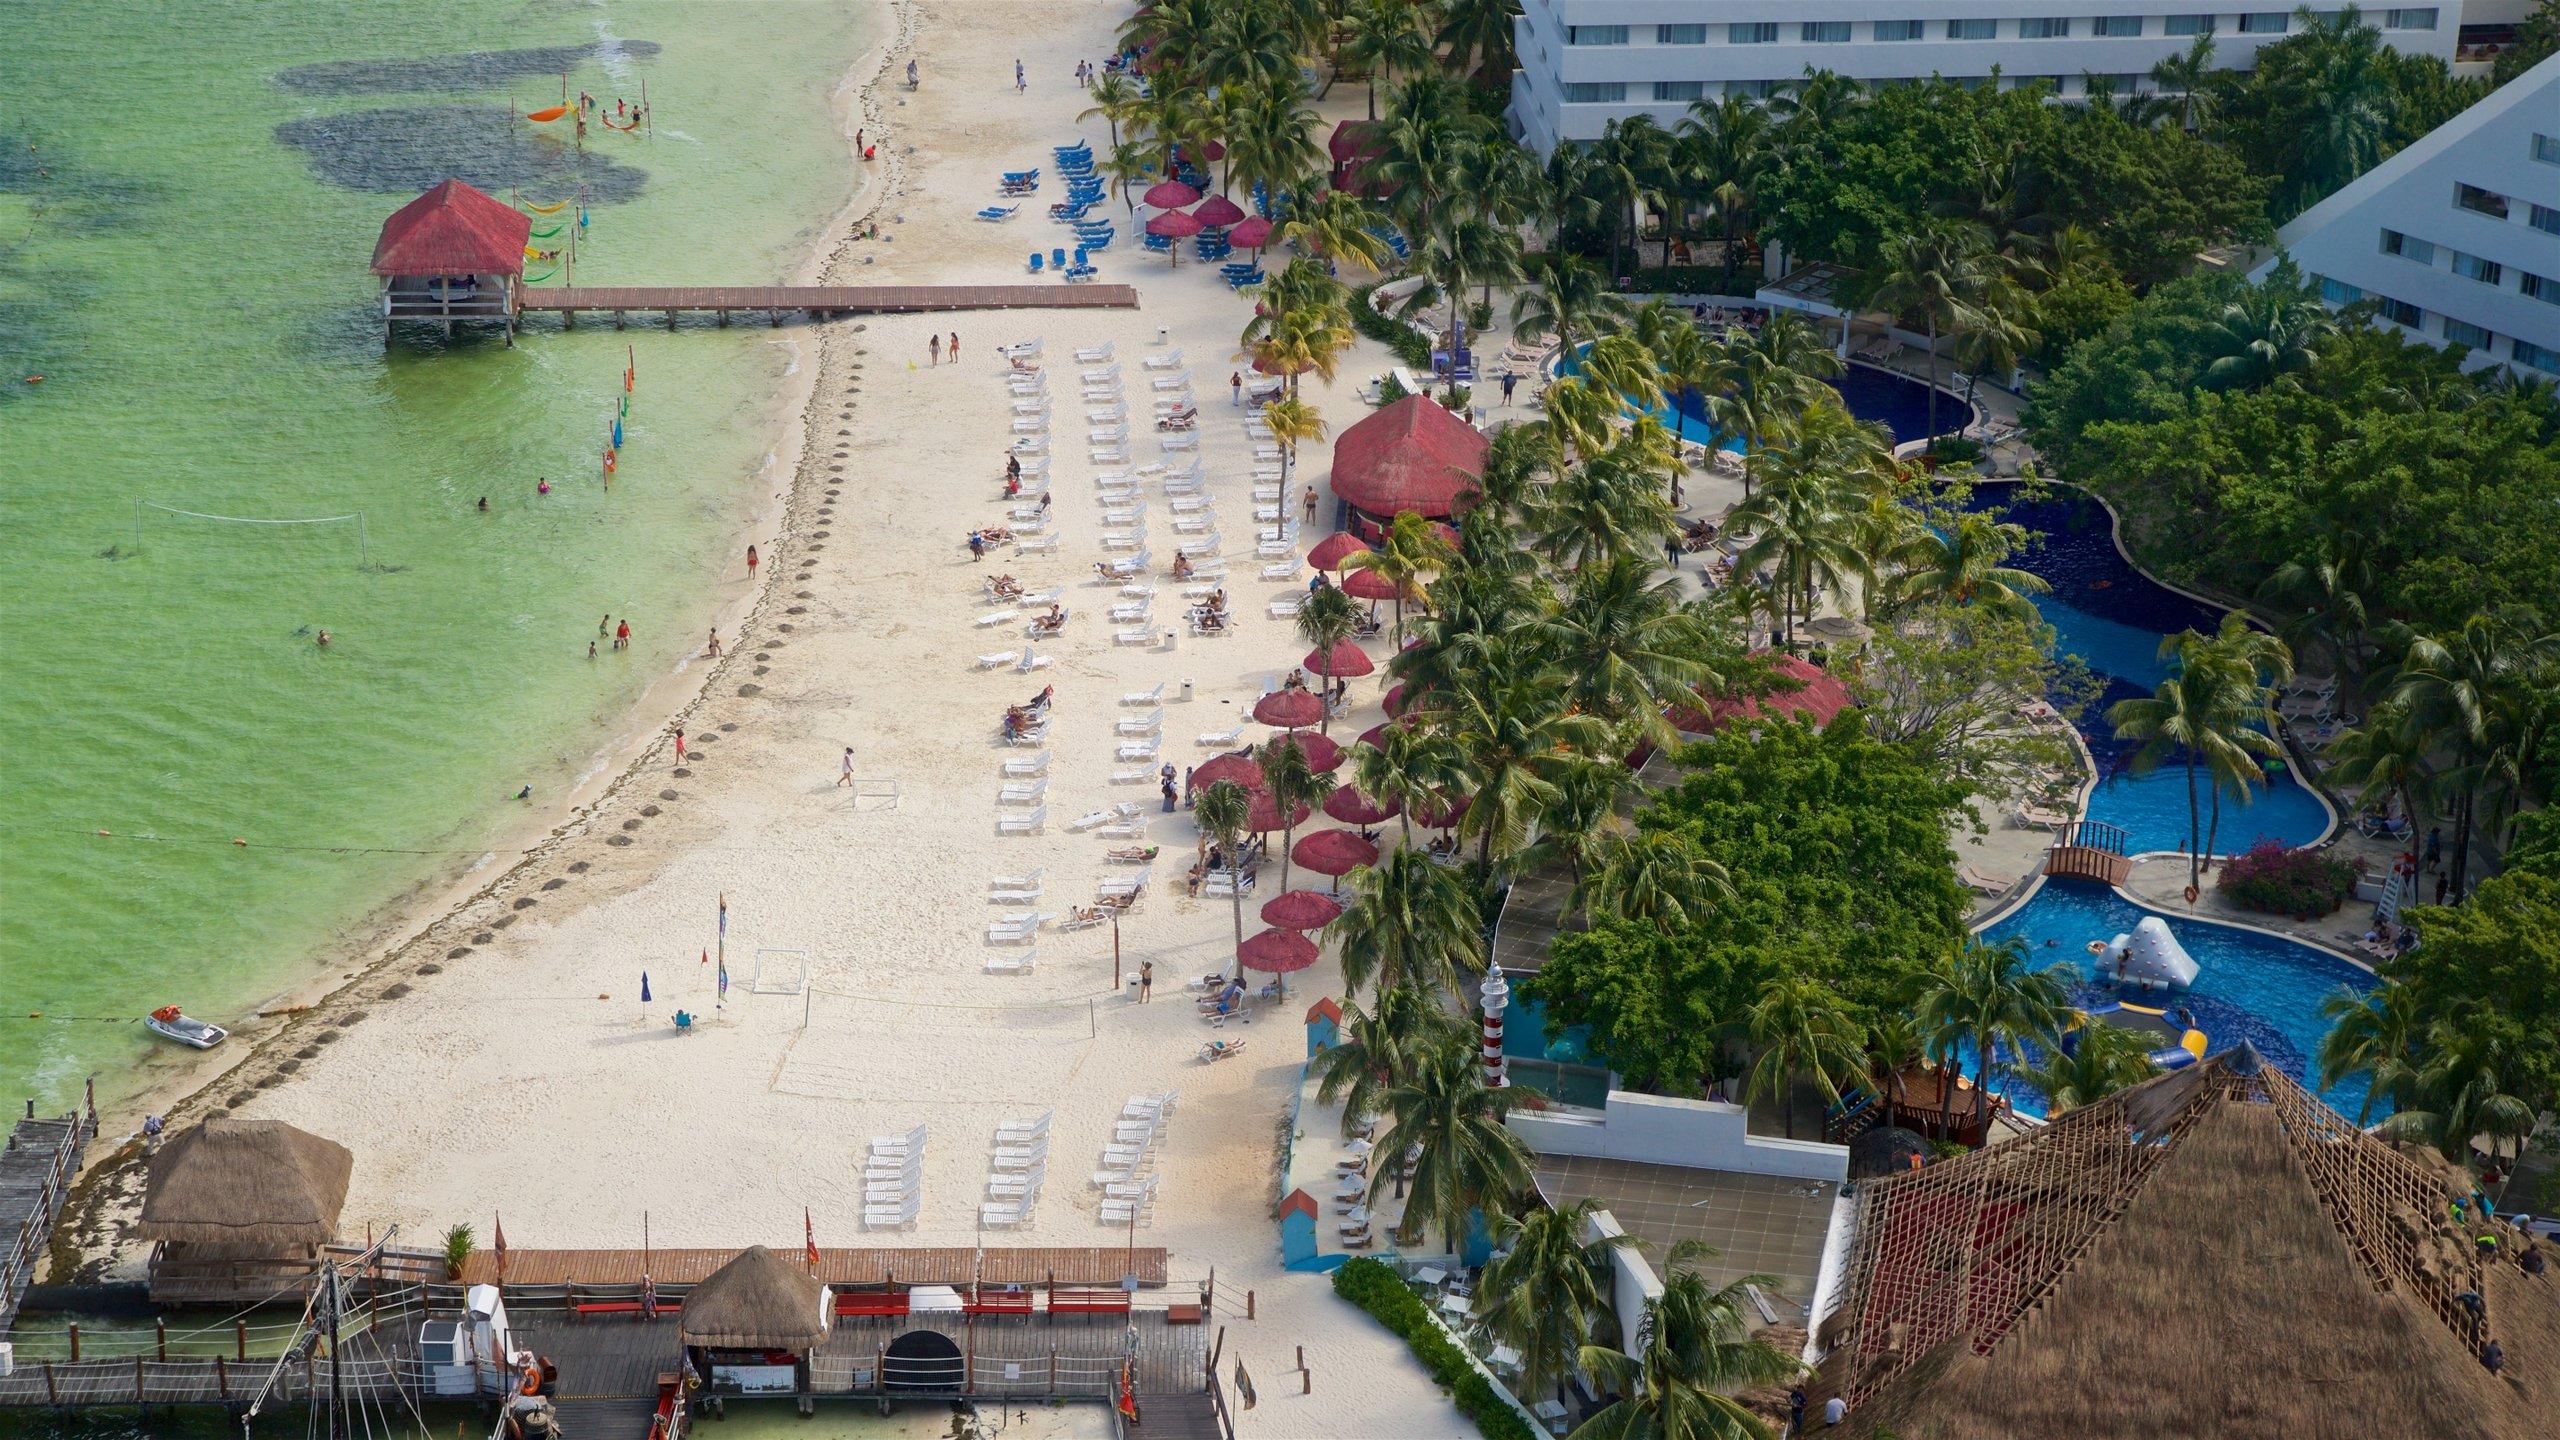 Zona Hotelera, Cancun, Quintana Roo, Mexico